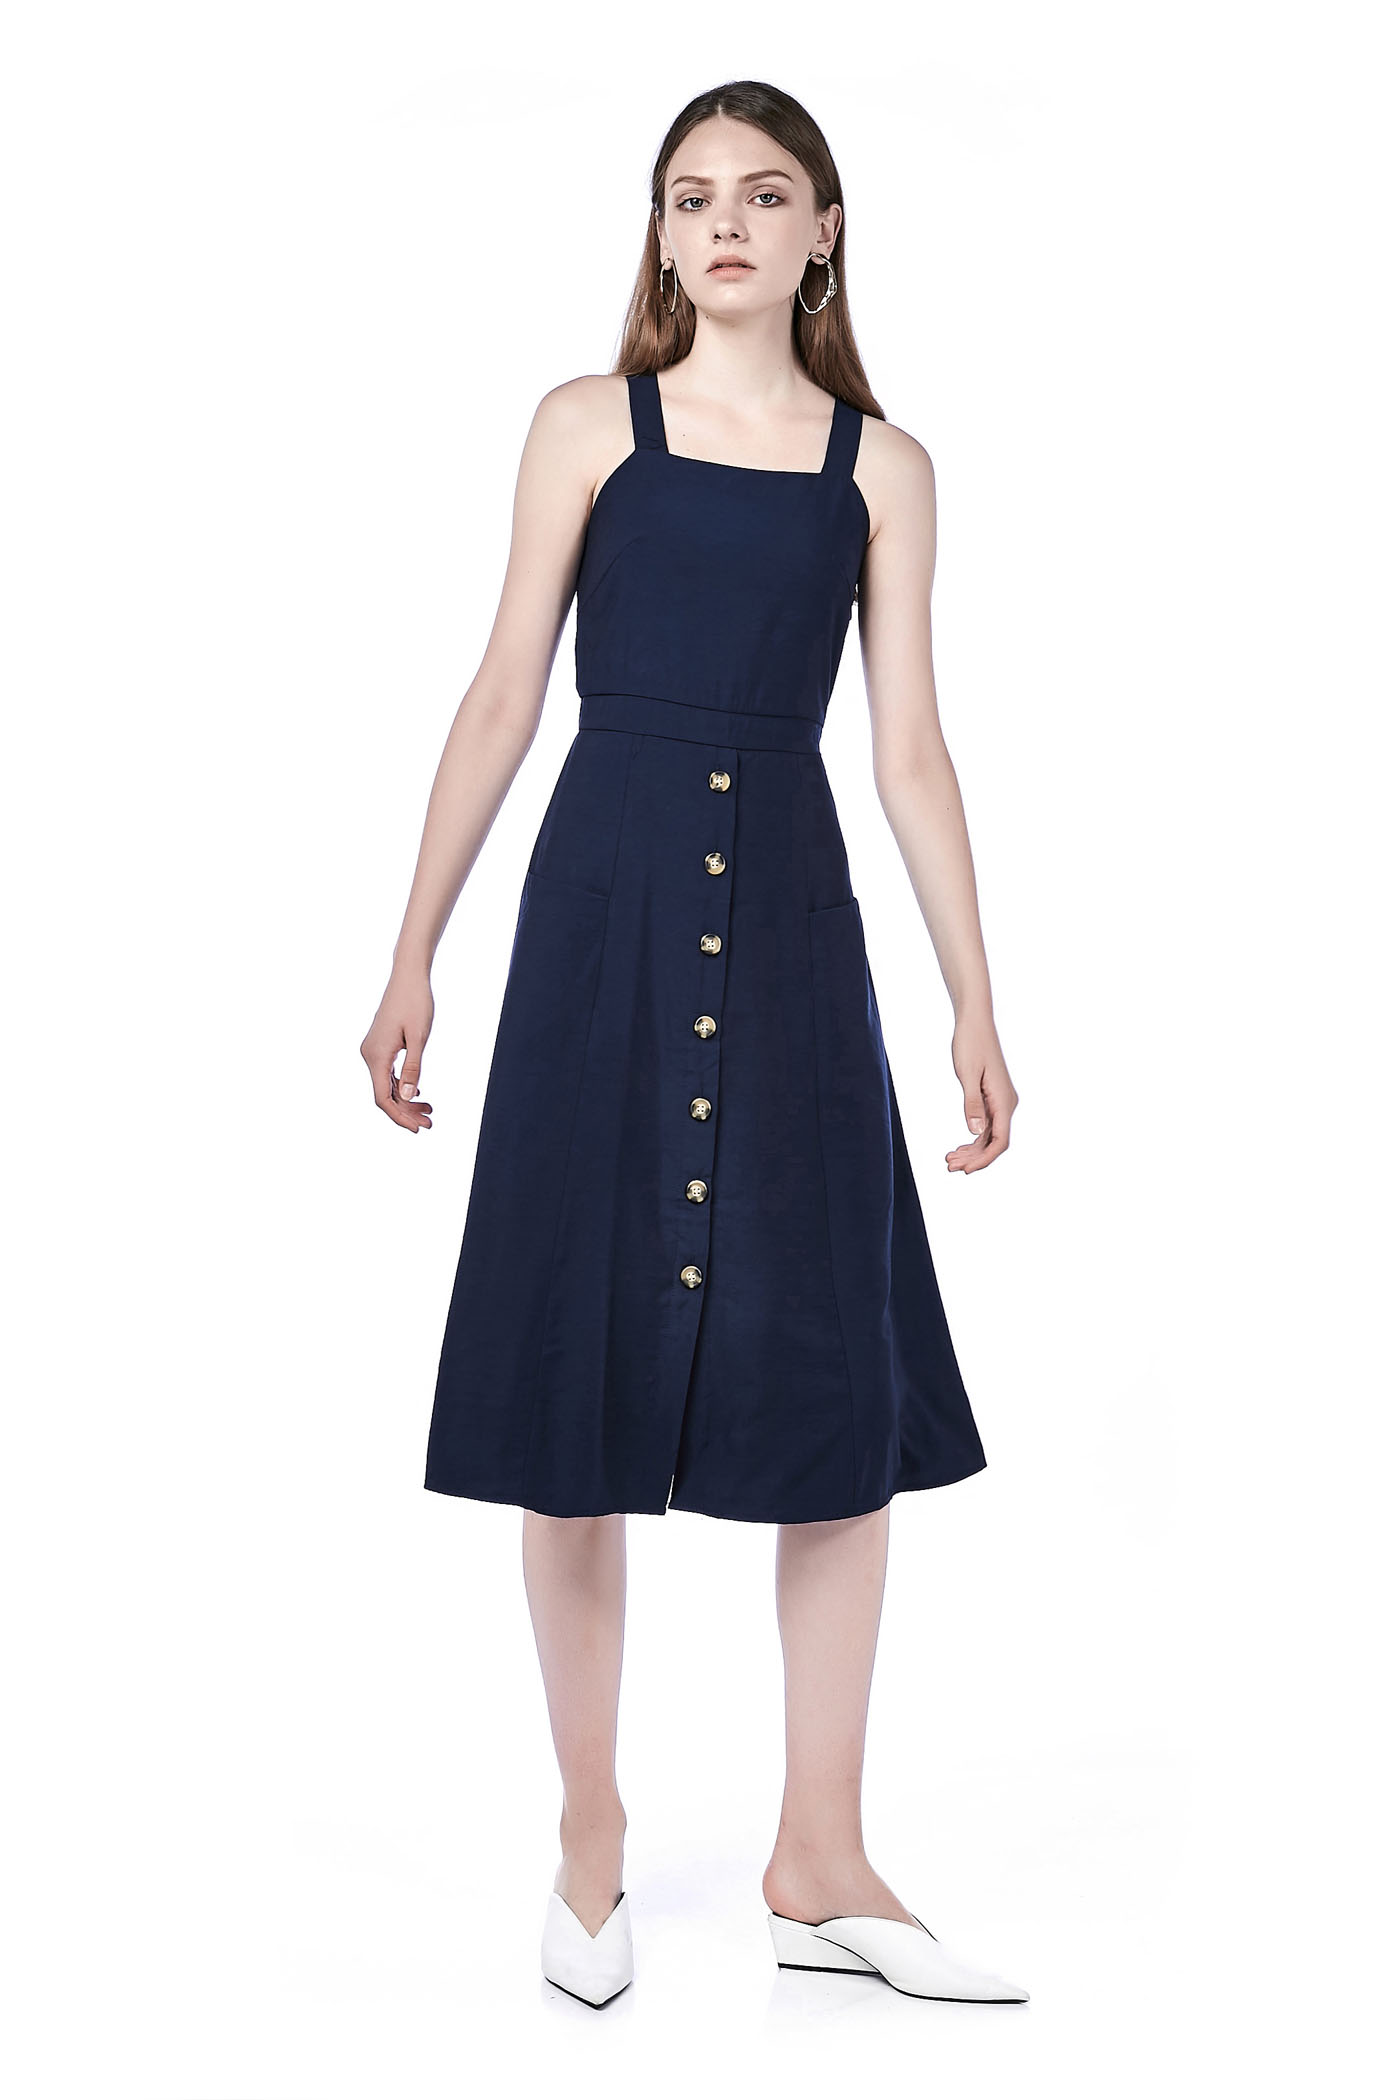 Cynta Button-Down Midi Dress